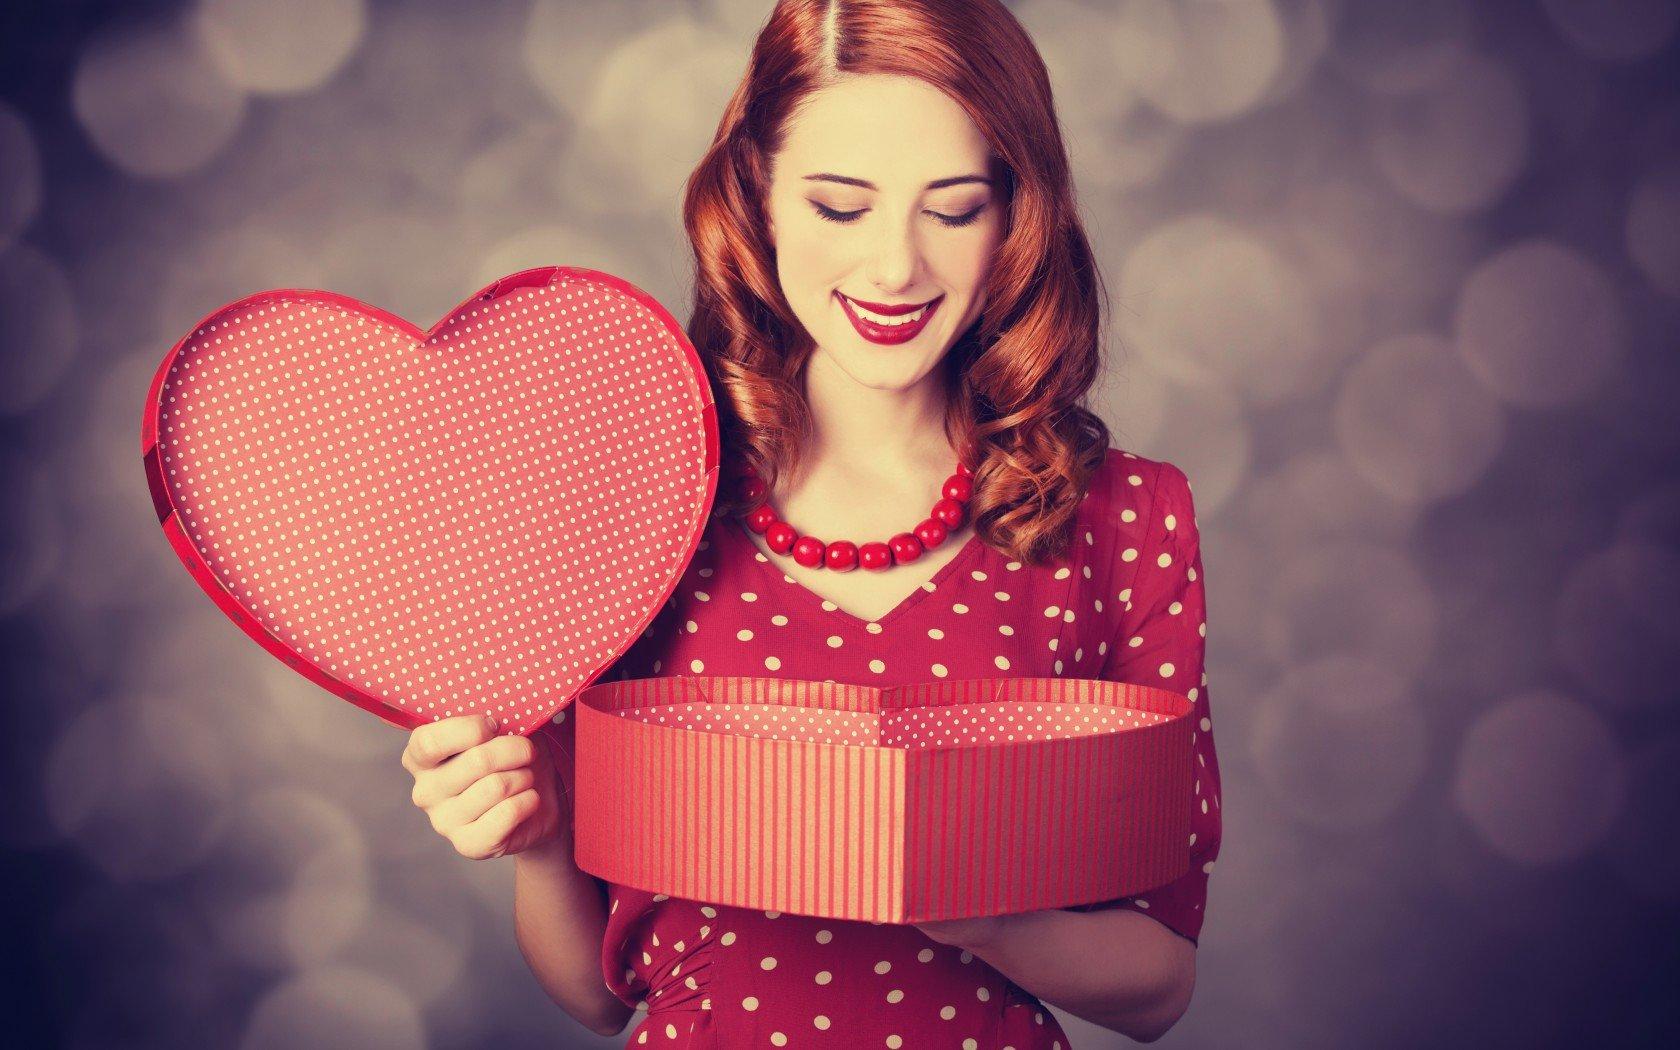 Валентинки картинки с девушками